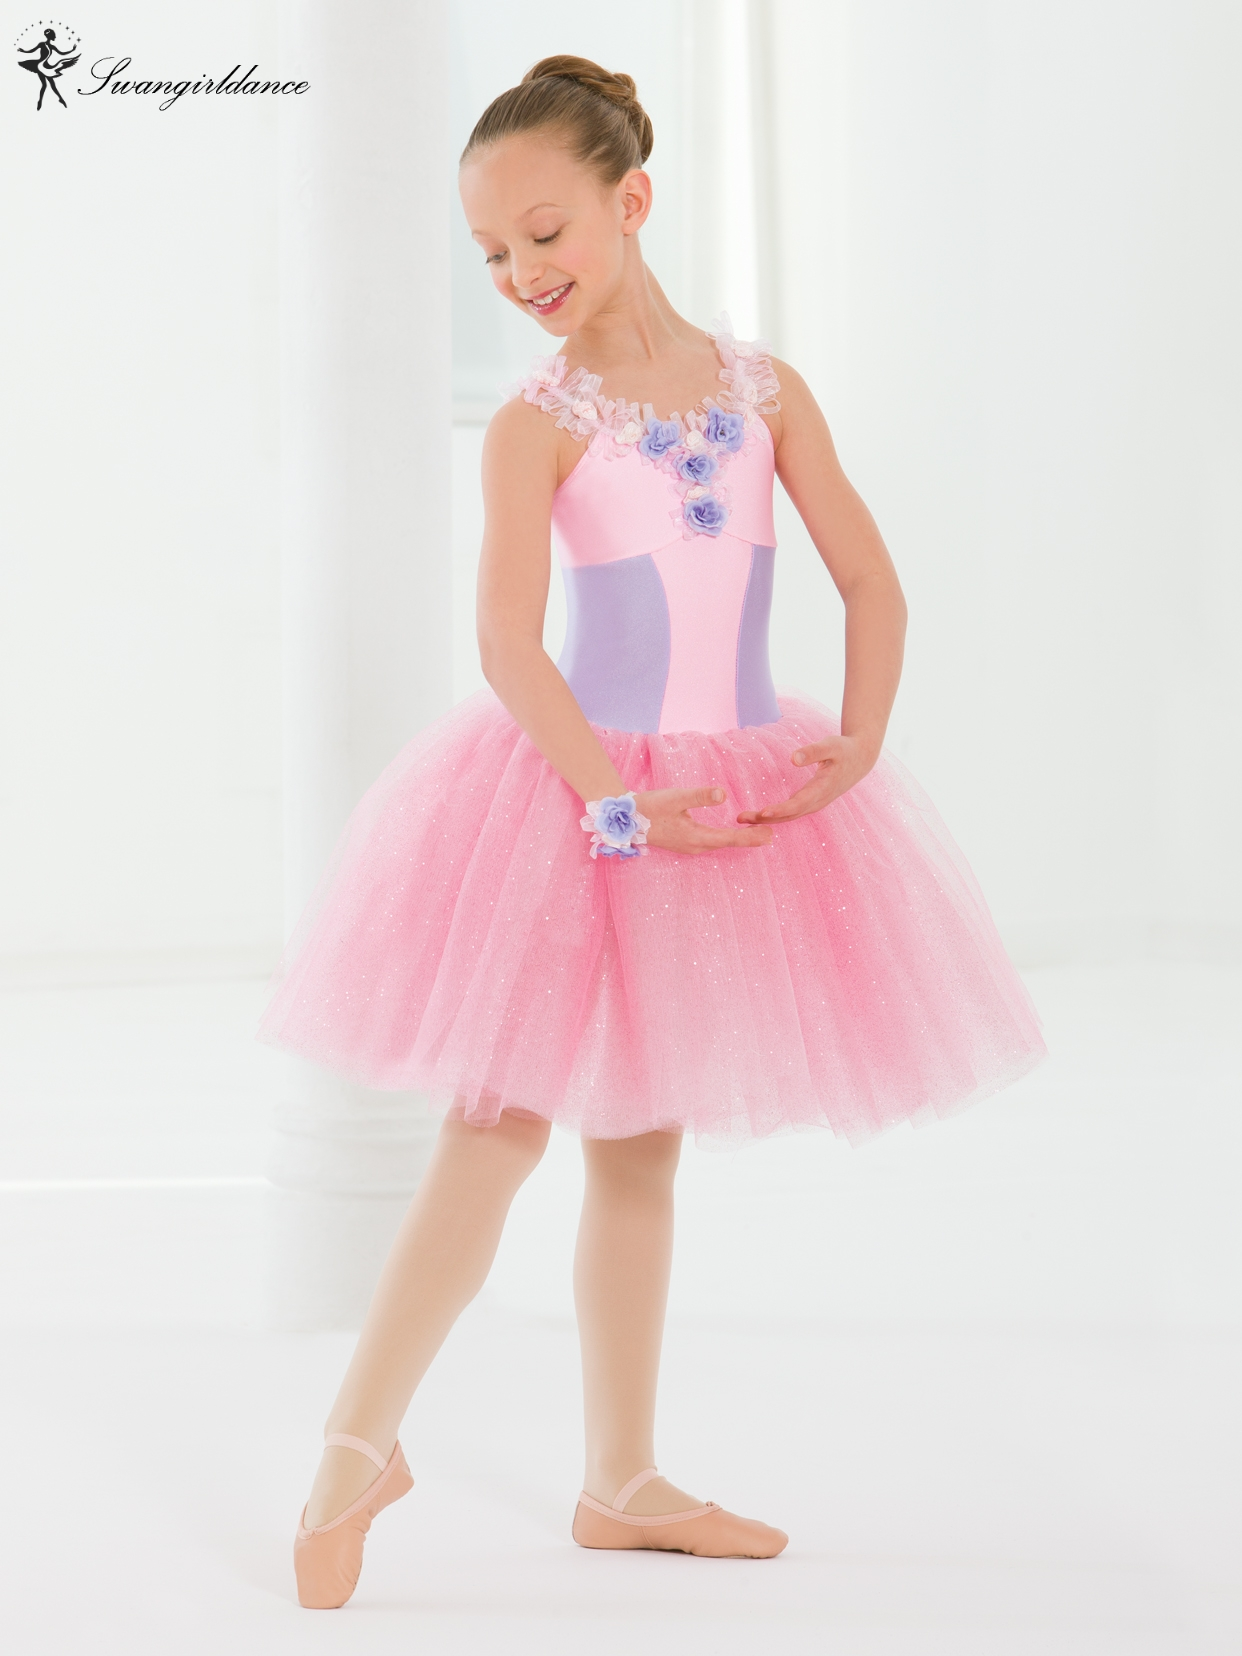 Contemporáneo Vestidos De Baile Charleston Sc Viñeta - Colección de ...